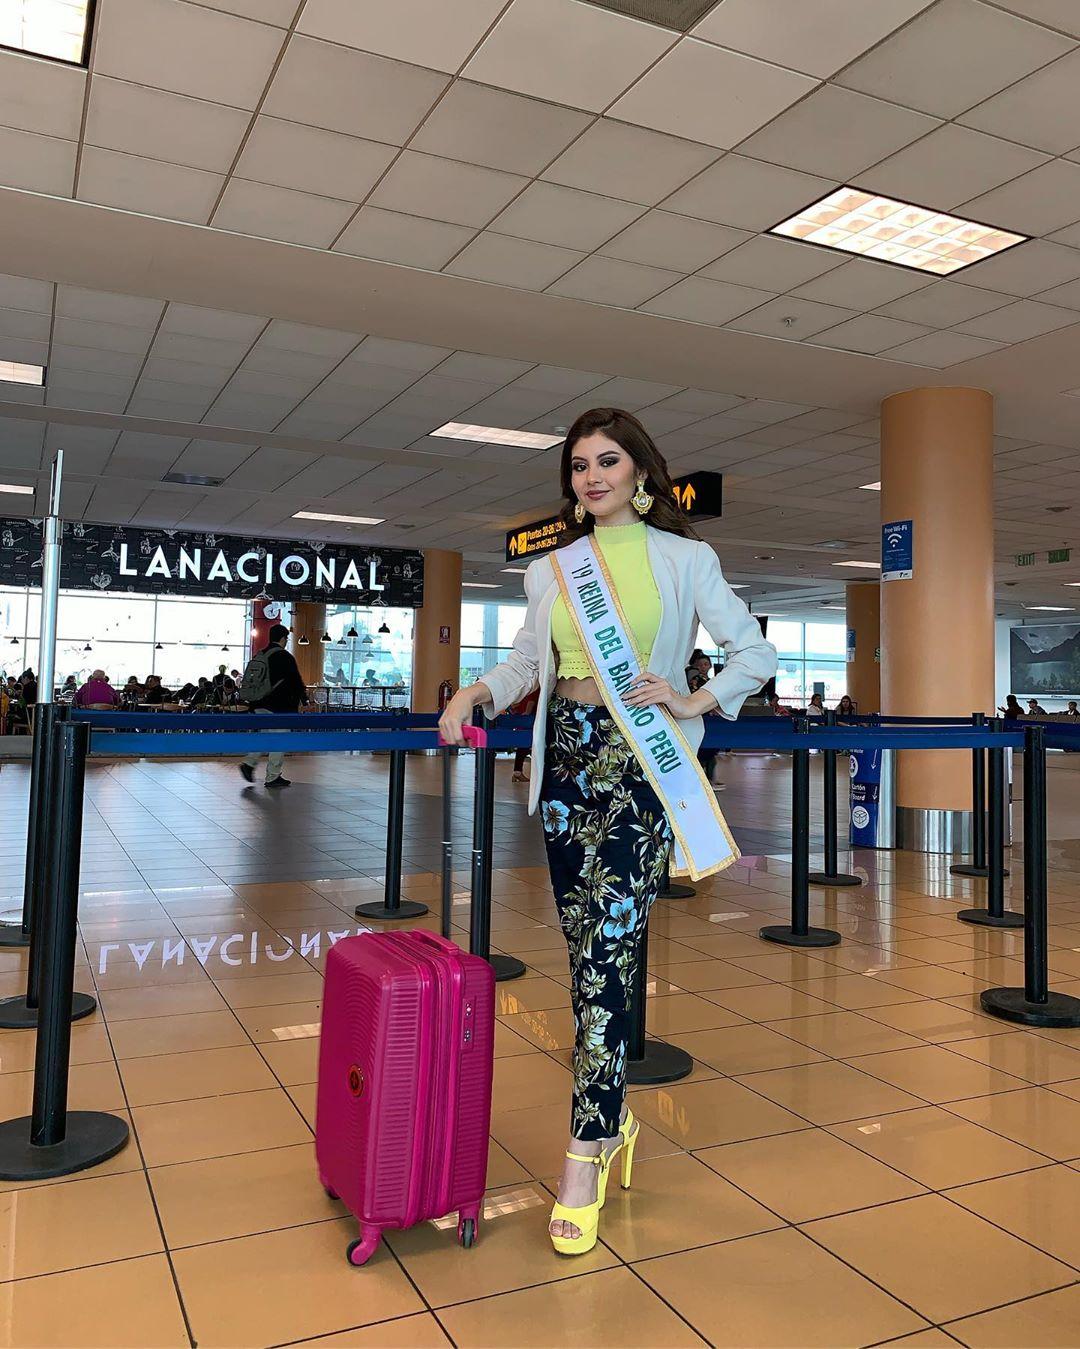 alexandra pinillos, 3ra finalista de reyna mundial banano 2019. - Página 2 70146510